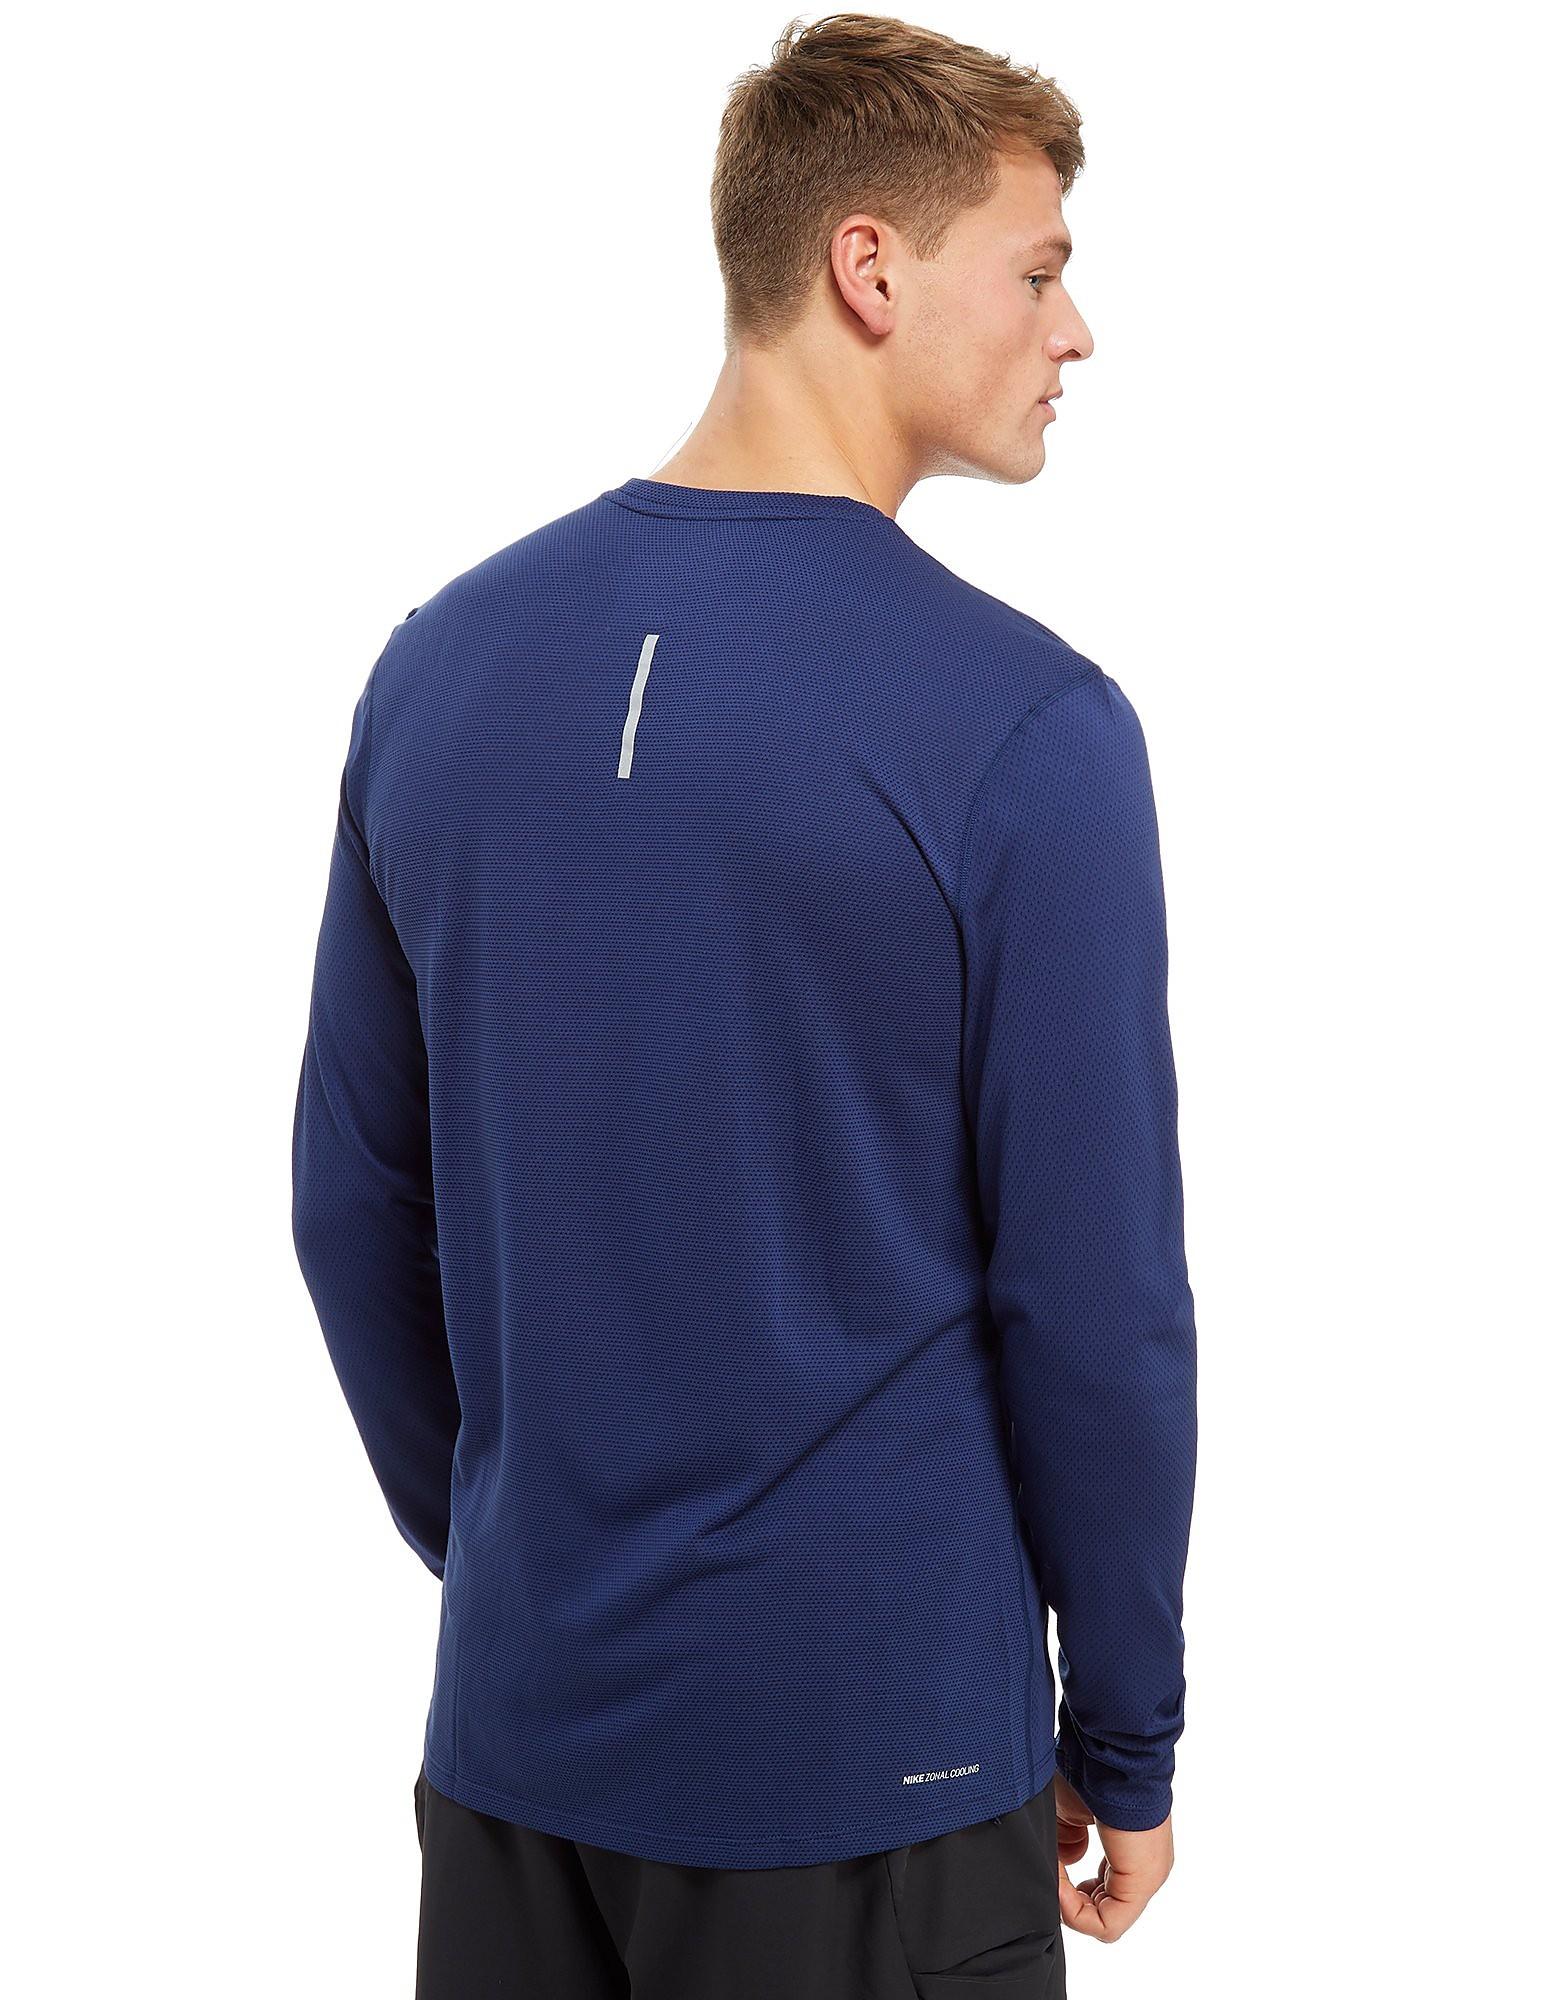 Nike Zonal Relay Long Sleeve Top